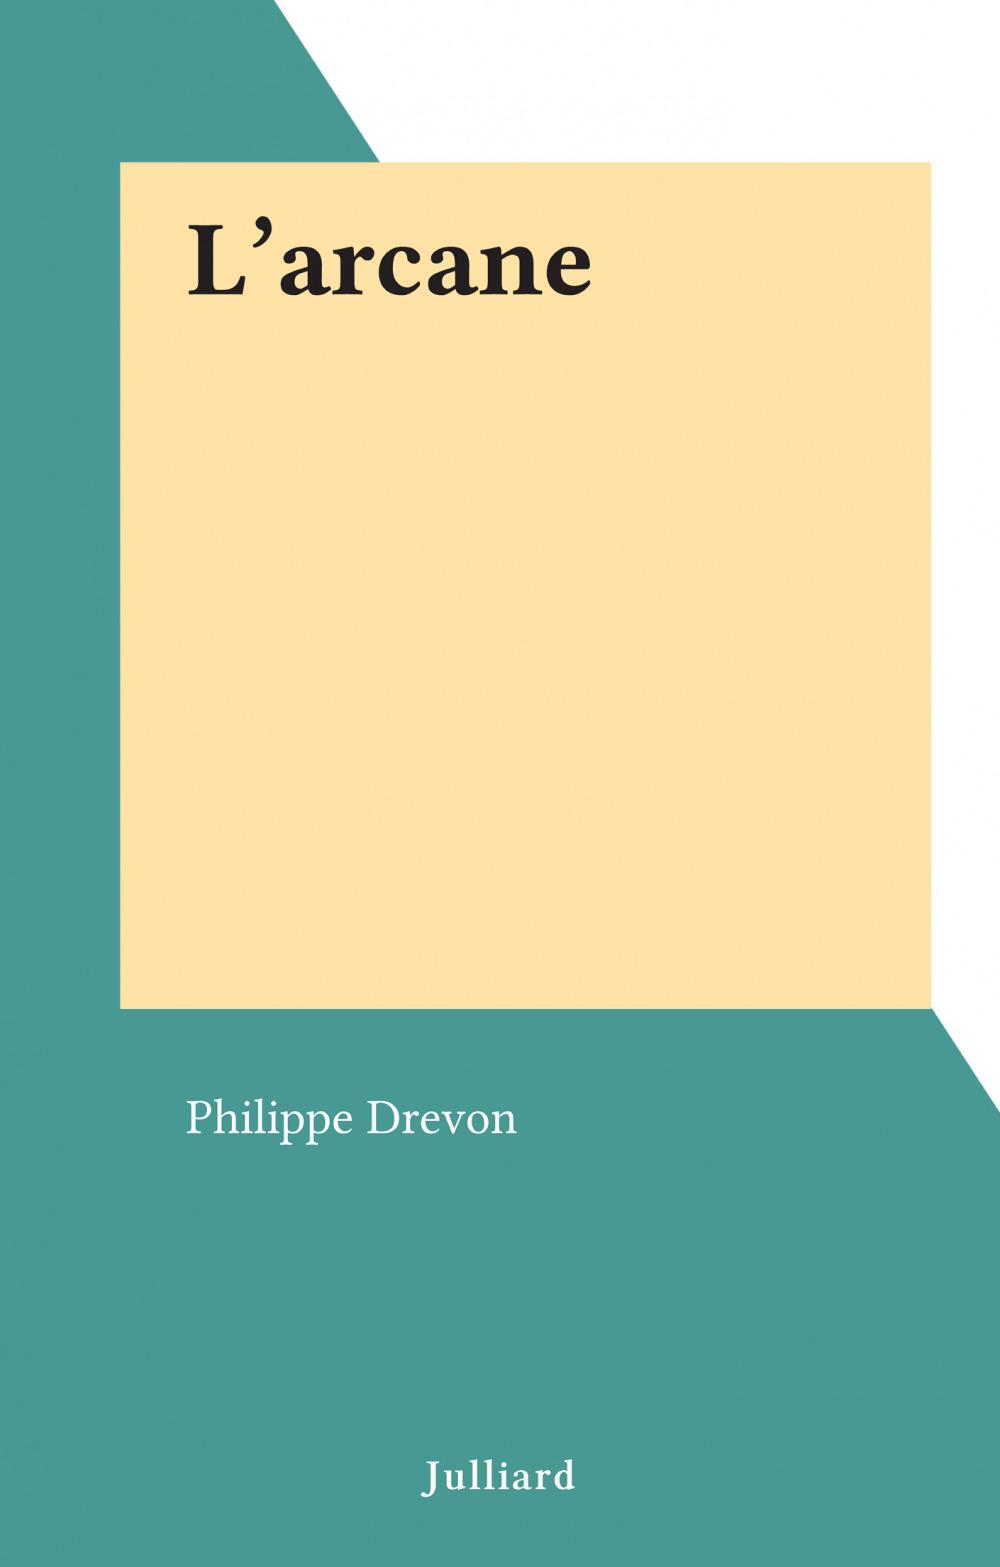 L'arcane  - Philippe Drevon